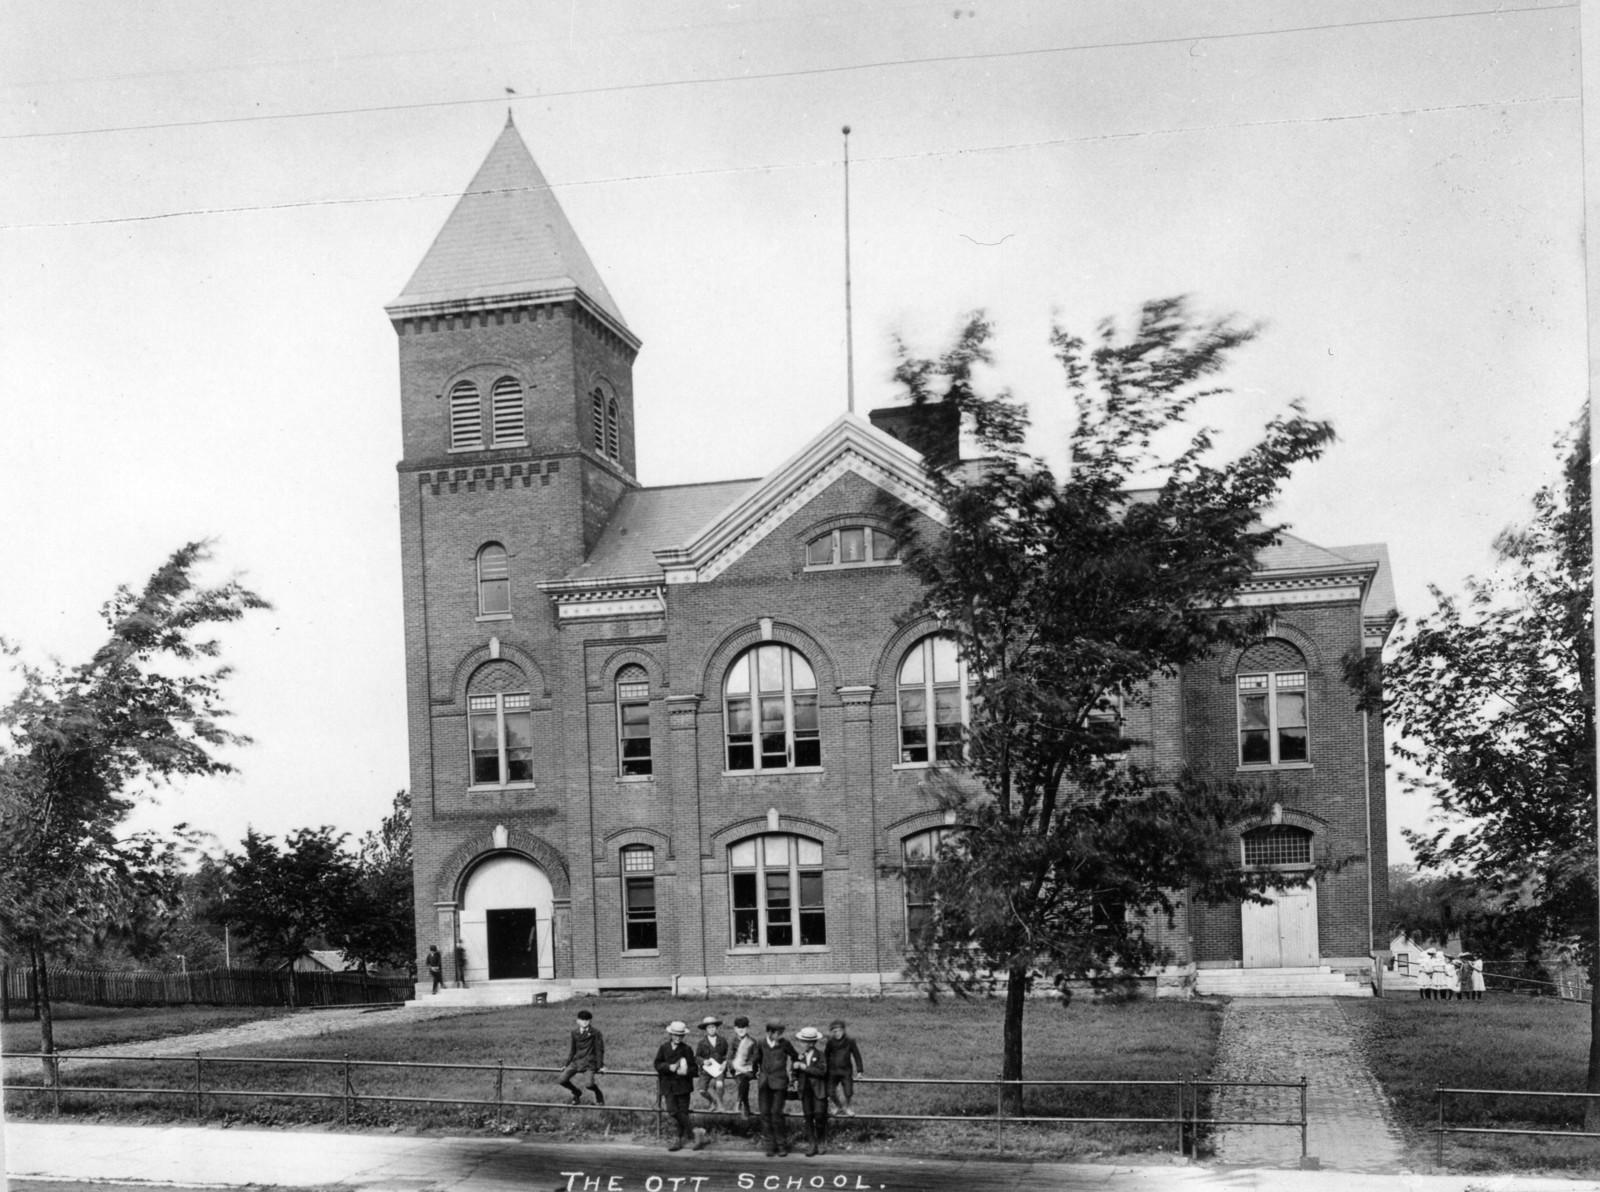 Photograph of Ott School